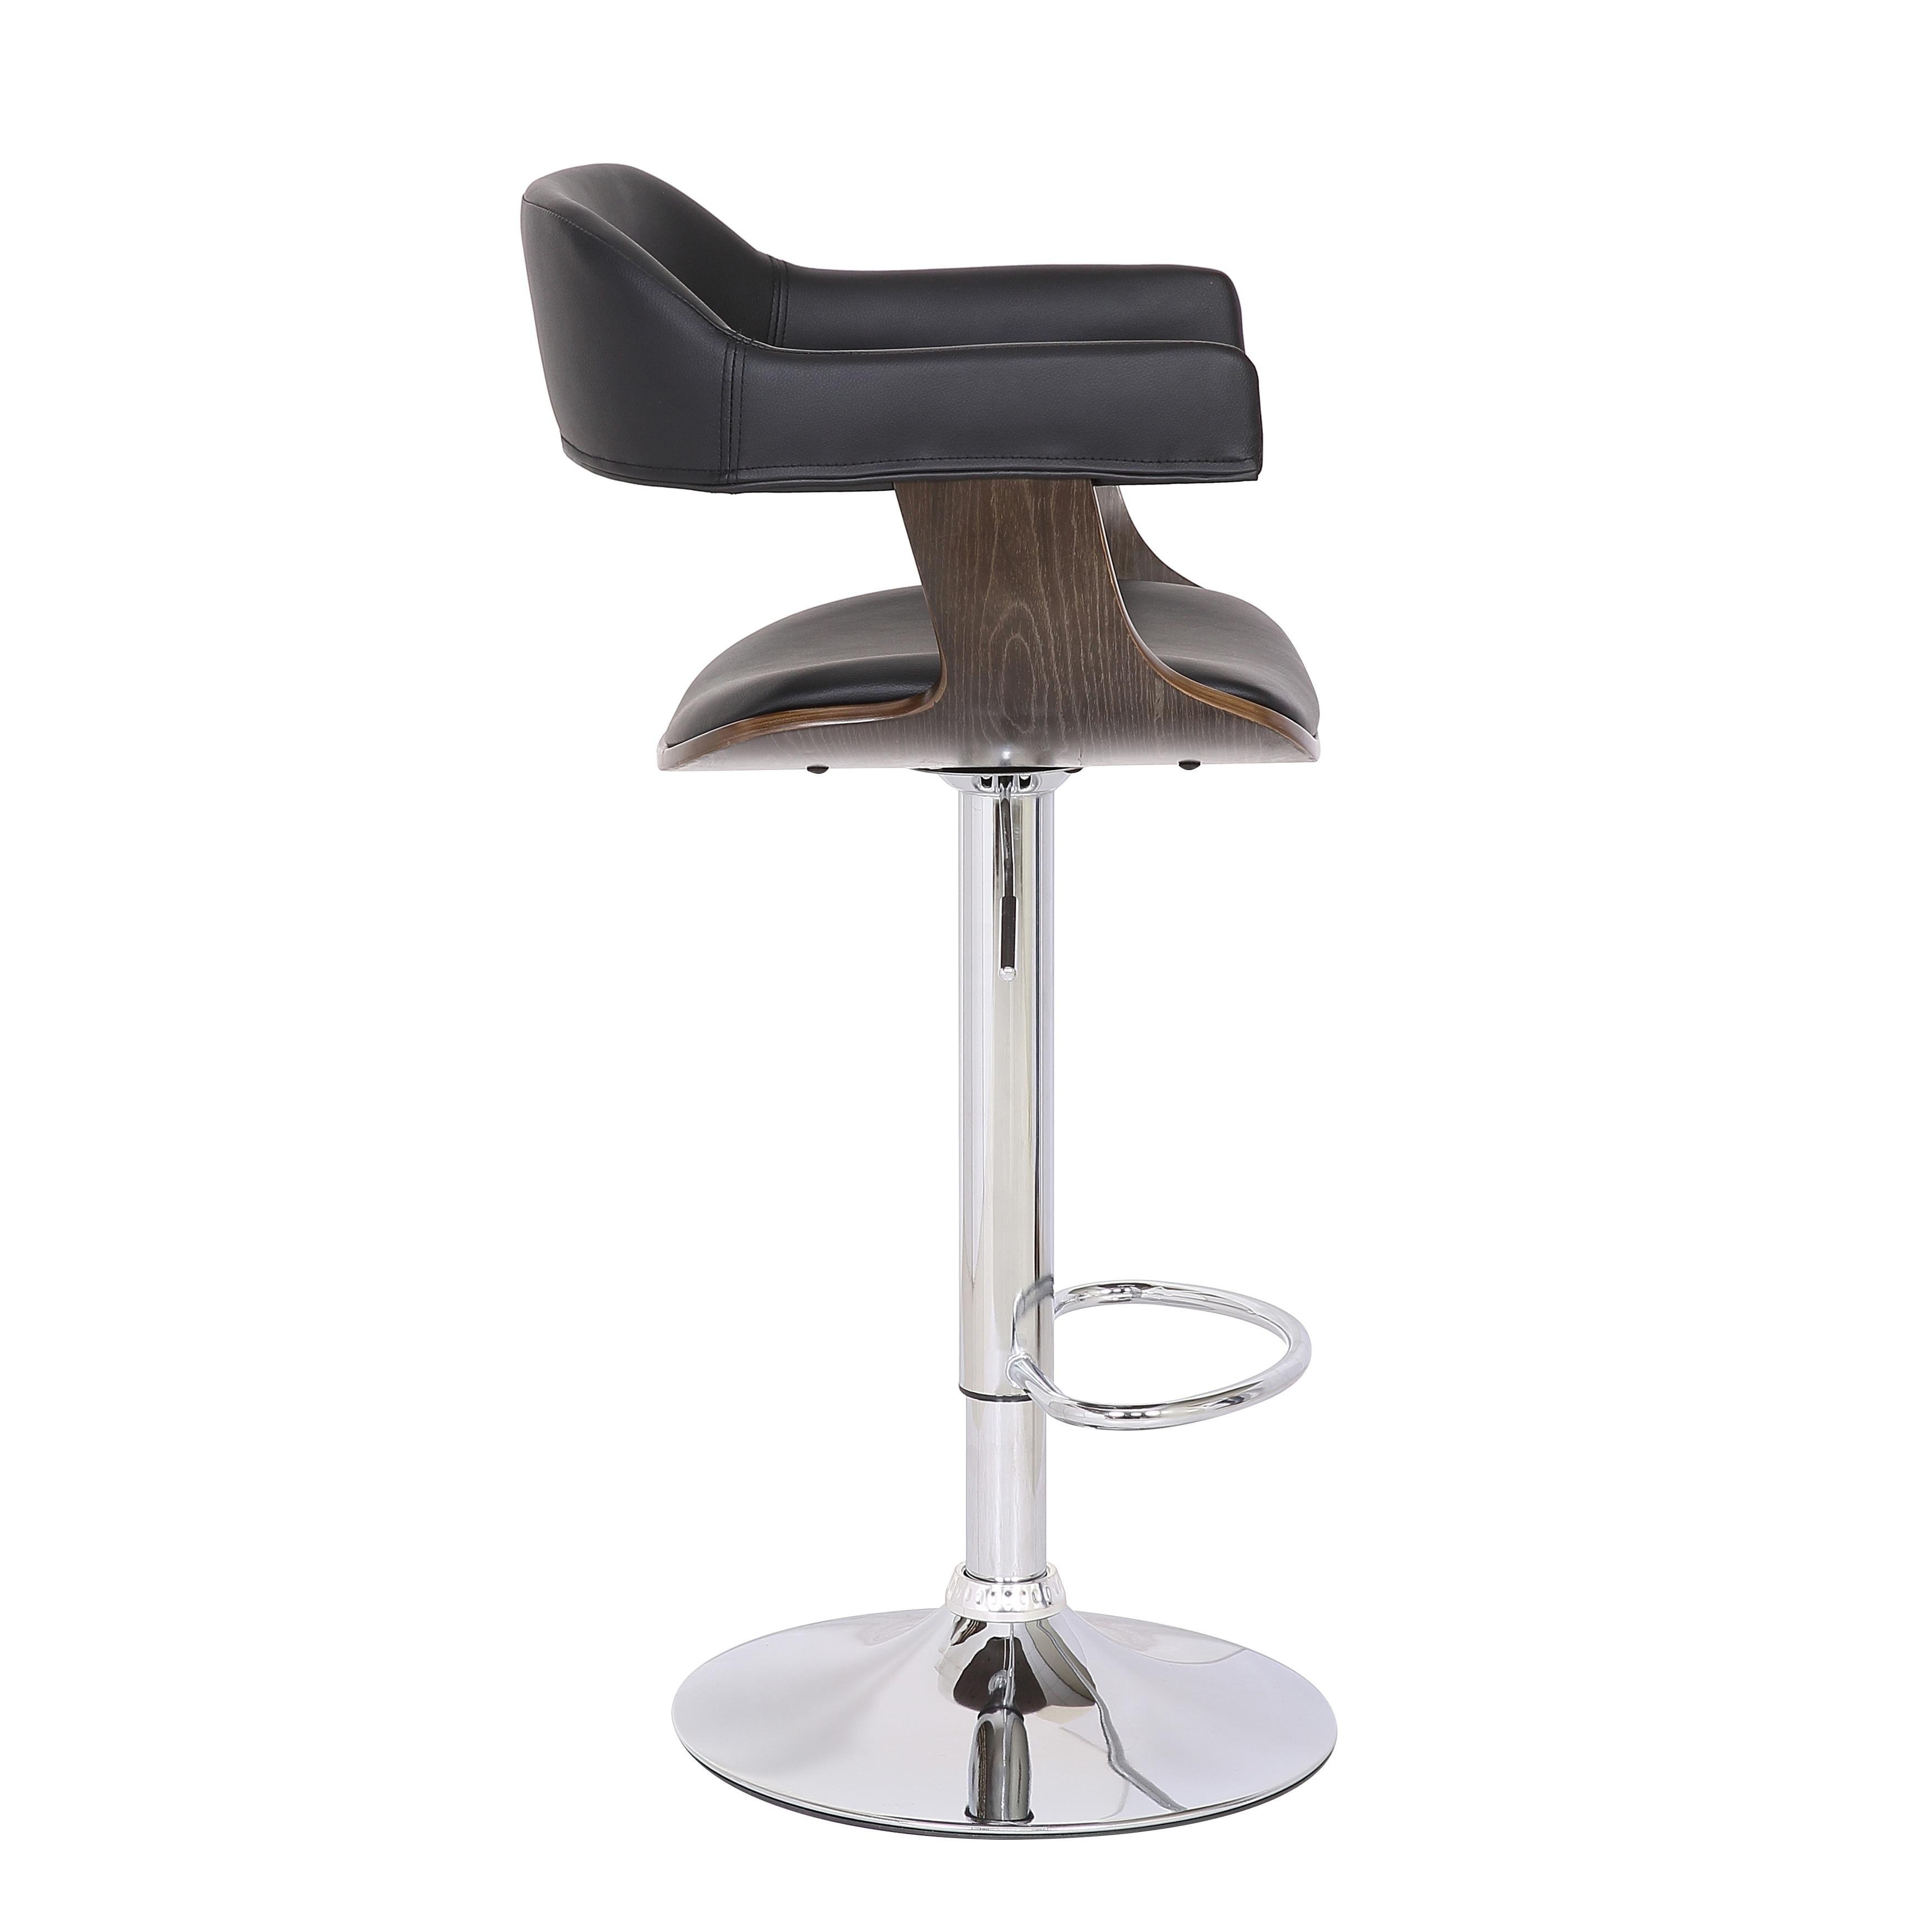 Shop Black Friday Deals On Contemporary Swivel Adjustable Oak Wood Barstool Set Of 3 Overstock 29297227